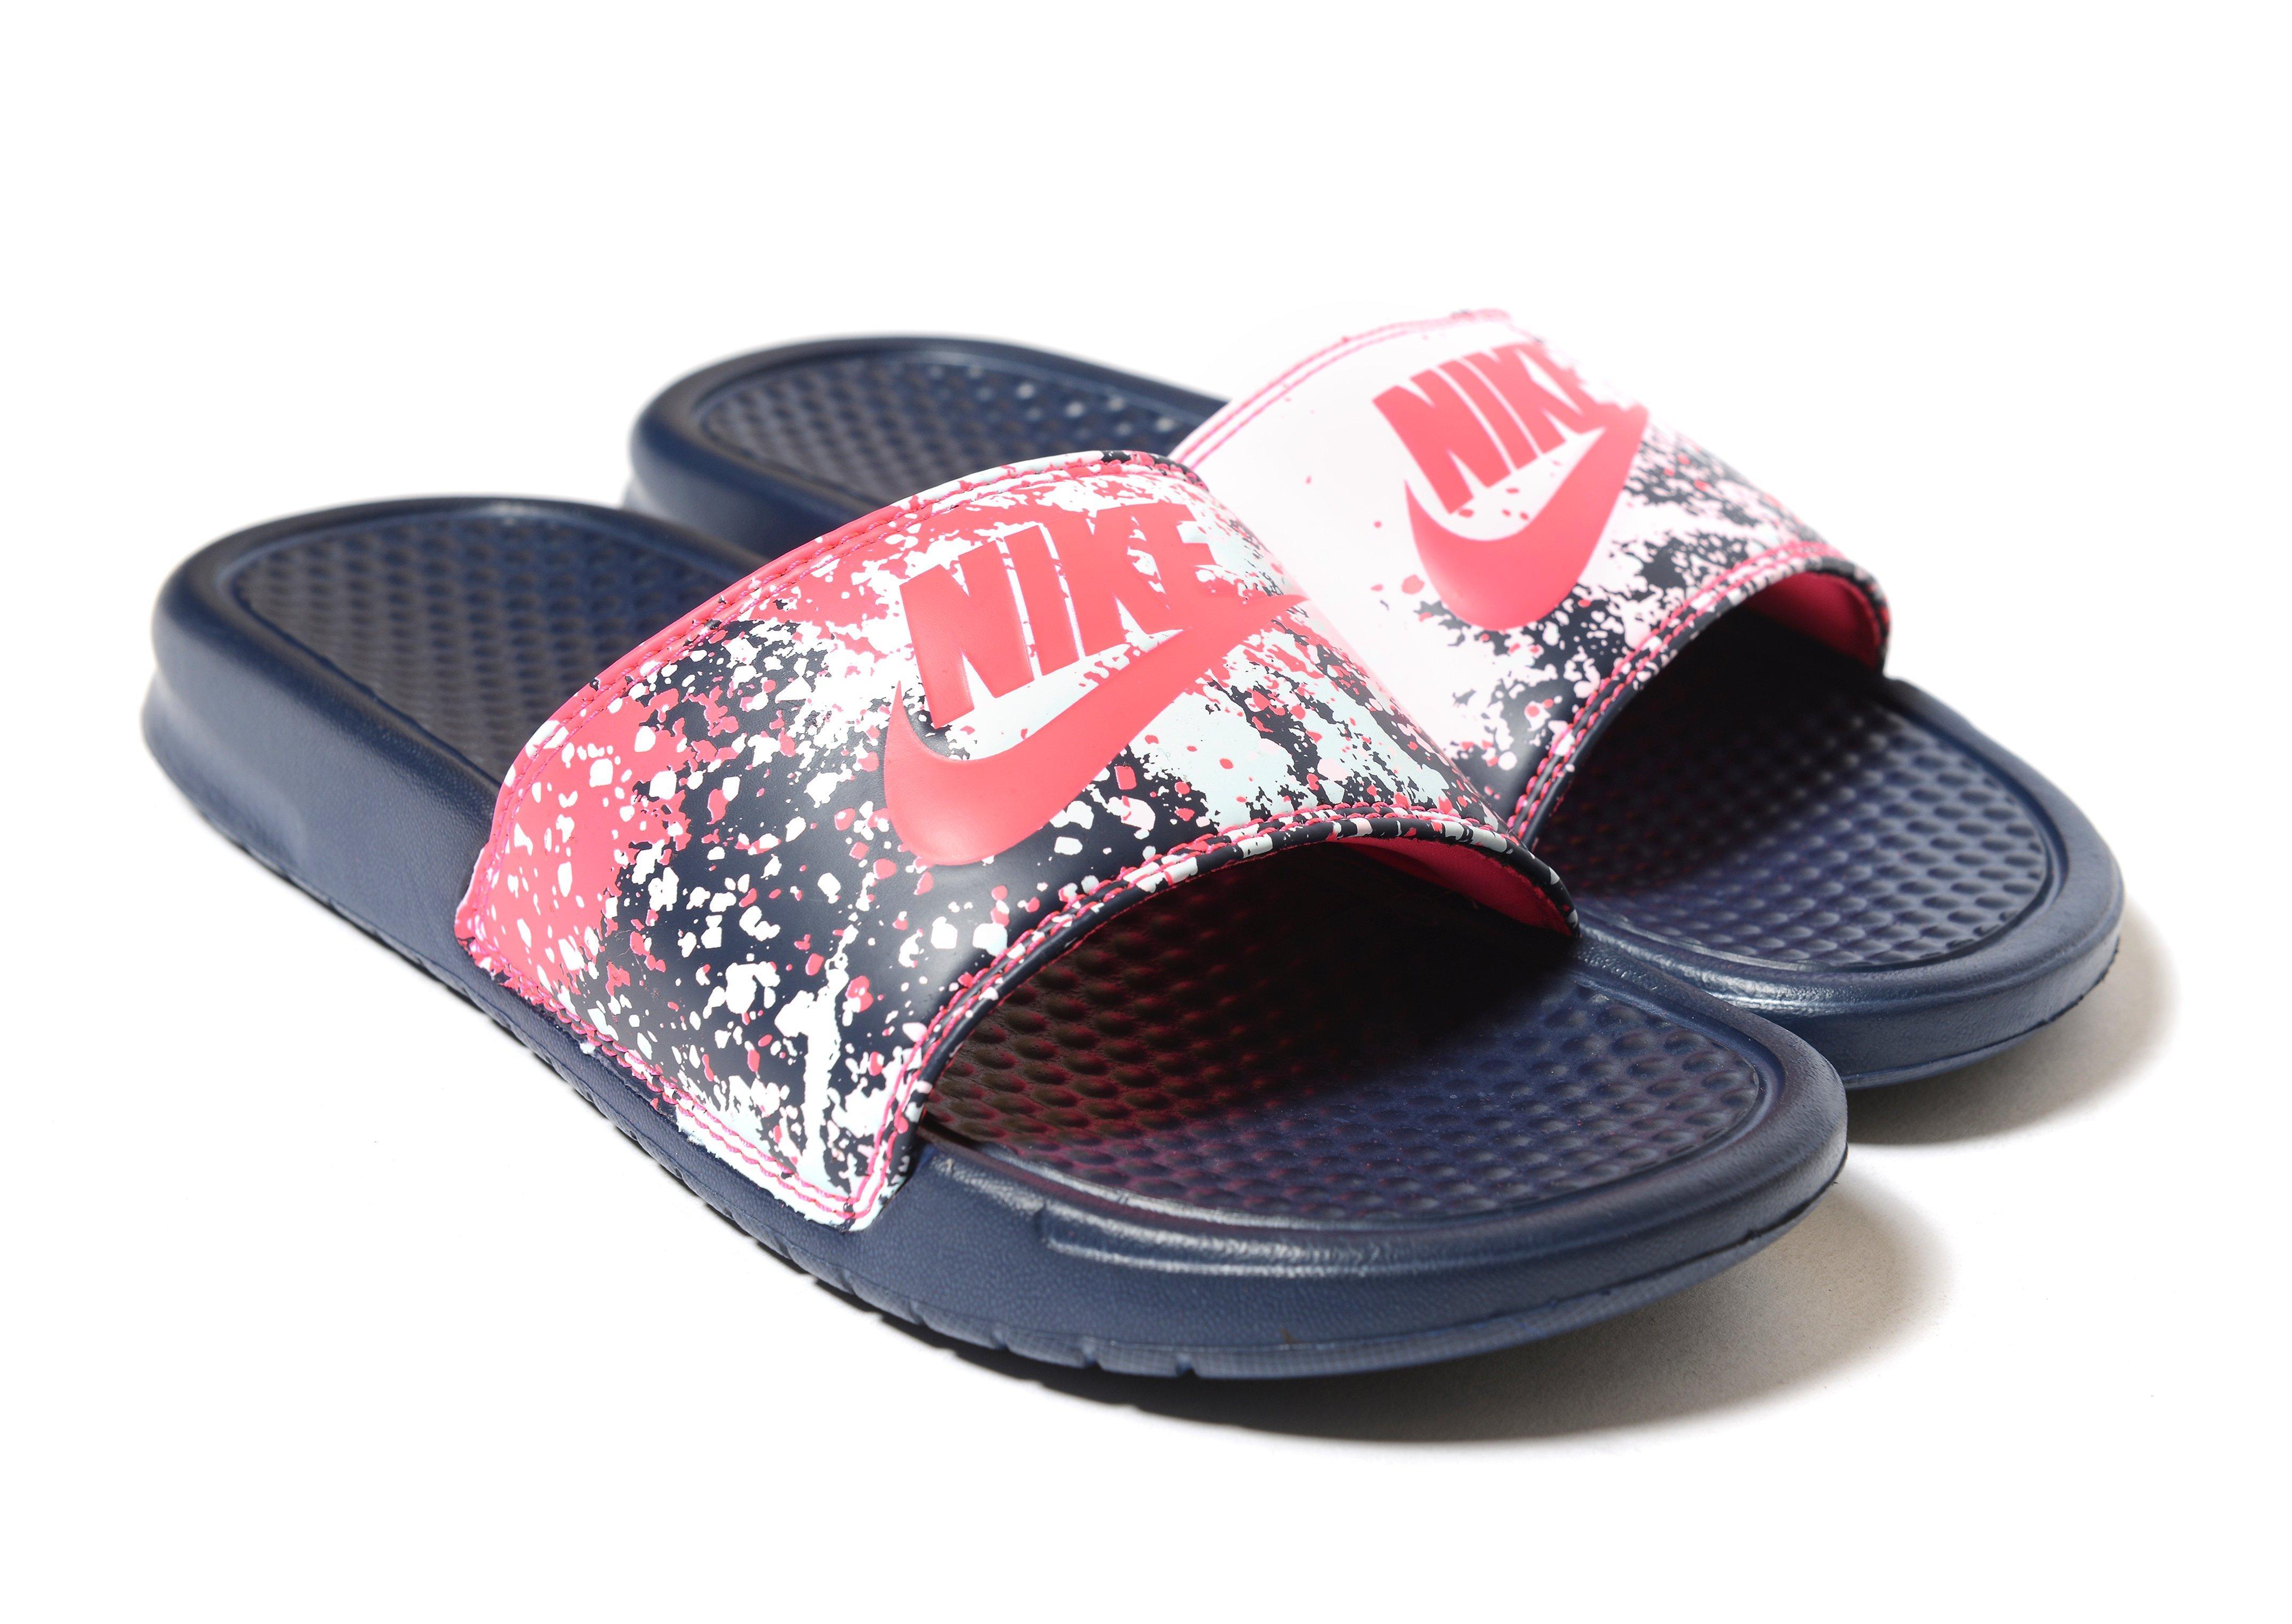 Bfgyv6y7 Sandale Nike Chaussures Sportswear Femme Re9212690